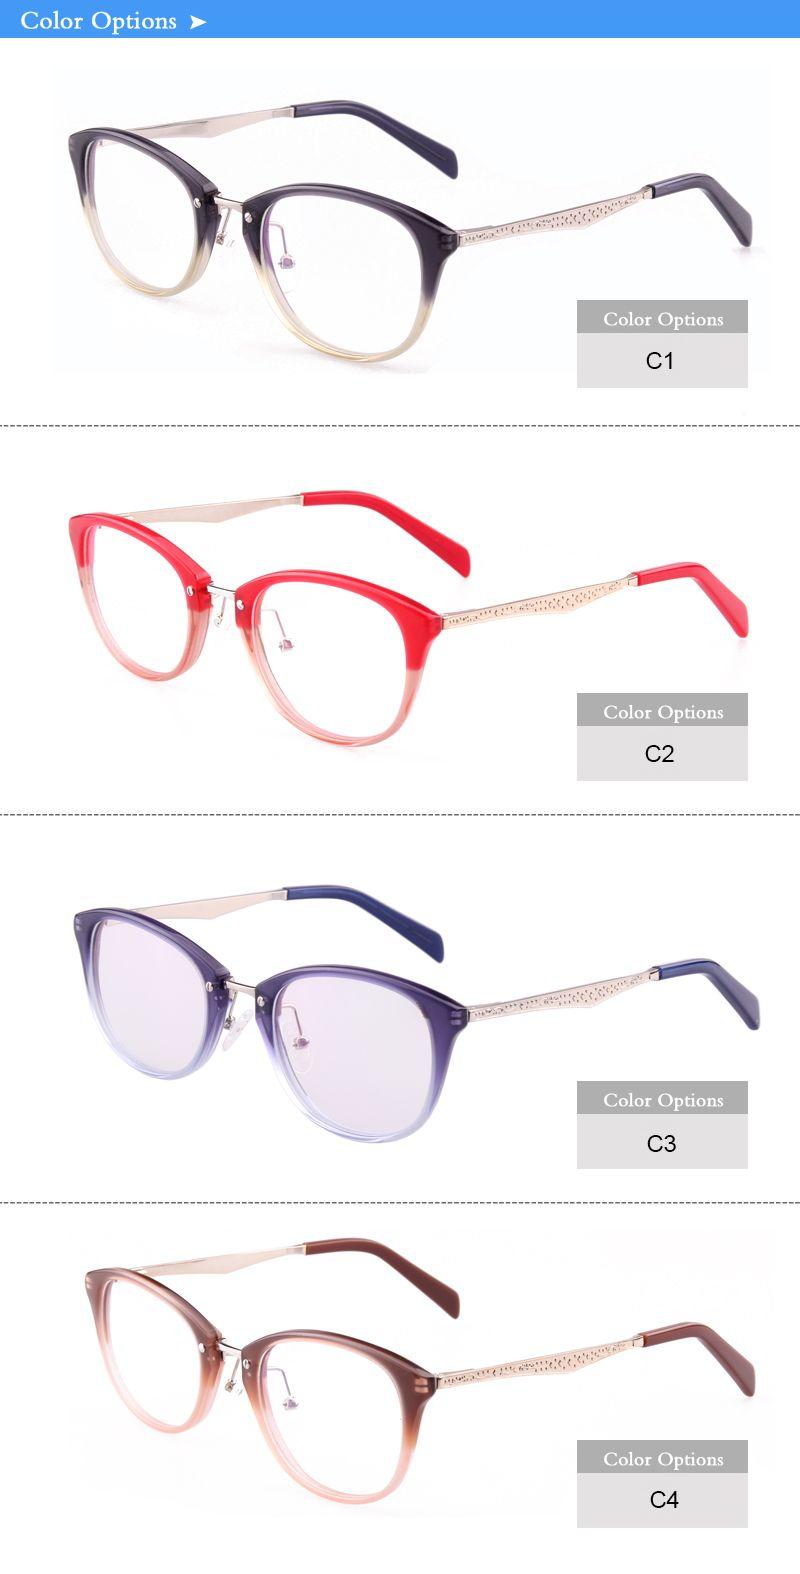 55bfef0b7b34 china eyeglass factory and eyeglass wholesale supplier. china eyeglass  factory and eyeglass wholesale supplier Optical Frames, Eyeglasses, Cat ...